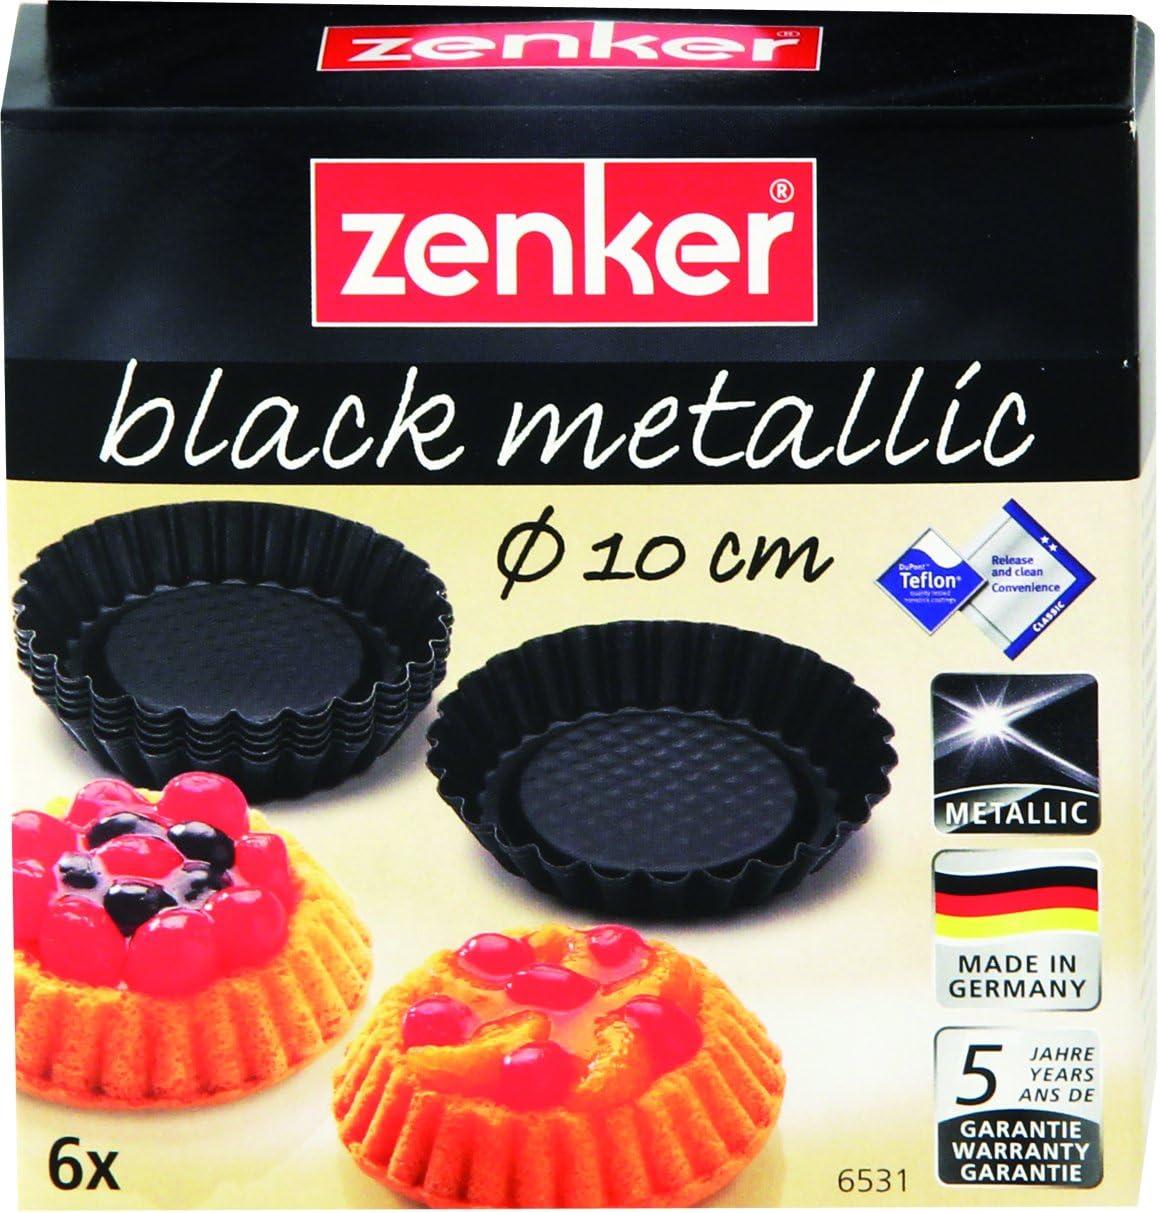 Zenker 6531 Mini Tart Pans (Set Of 6), Black/Metallic, 4.13